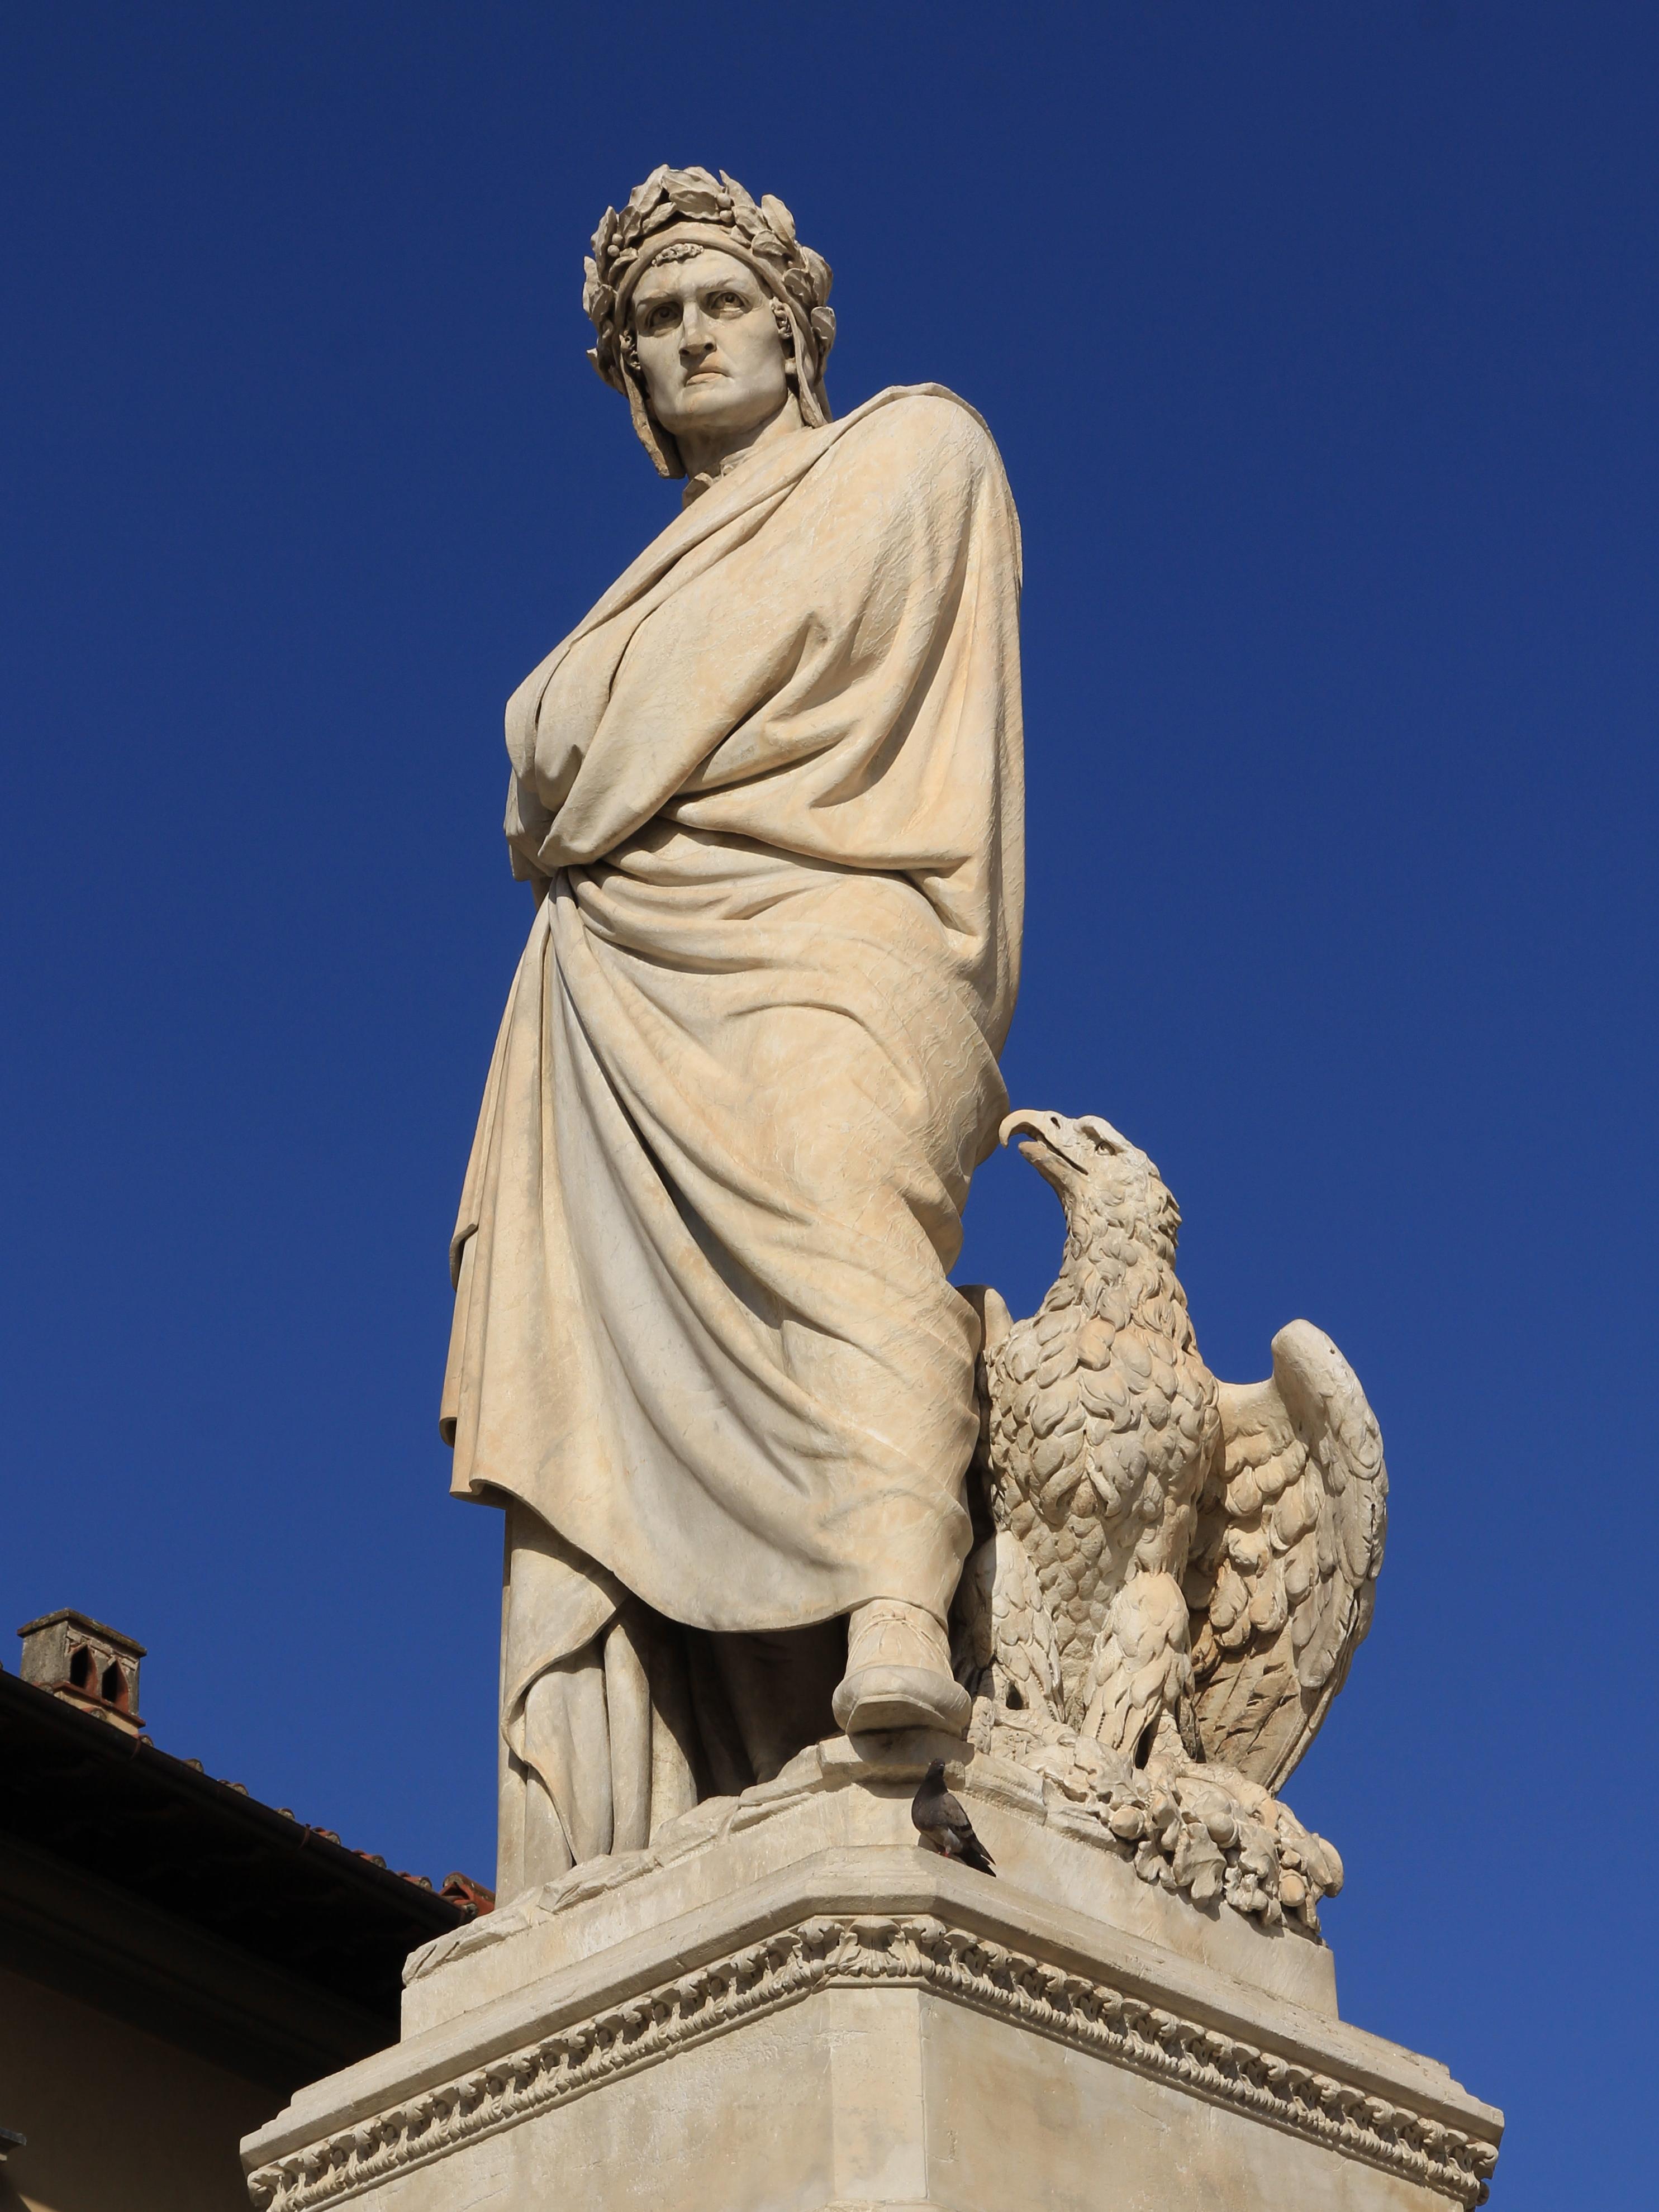 Dante Alighieri statue in the Piazza Santa Croce next to Basilica di Santa Croce (Basilica of the Holy Cross) in Florence, 1865, Enrico Pazzi. Photo taken on August 22, 2011.